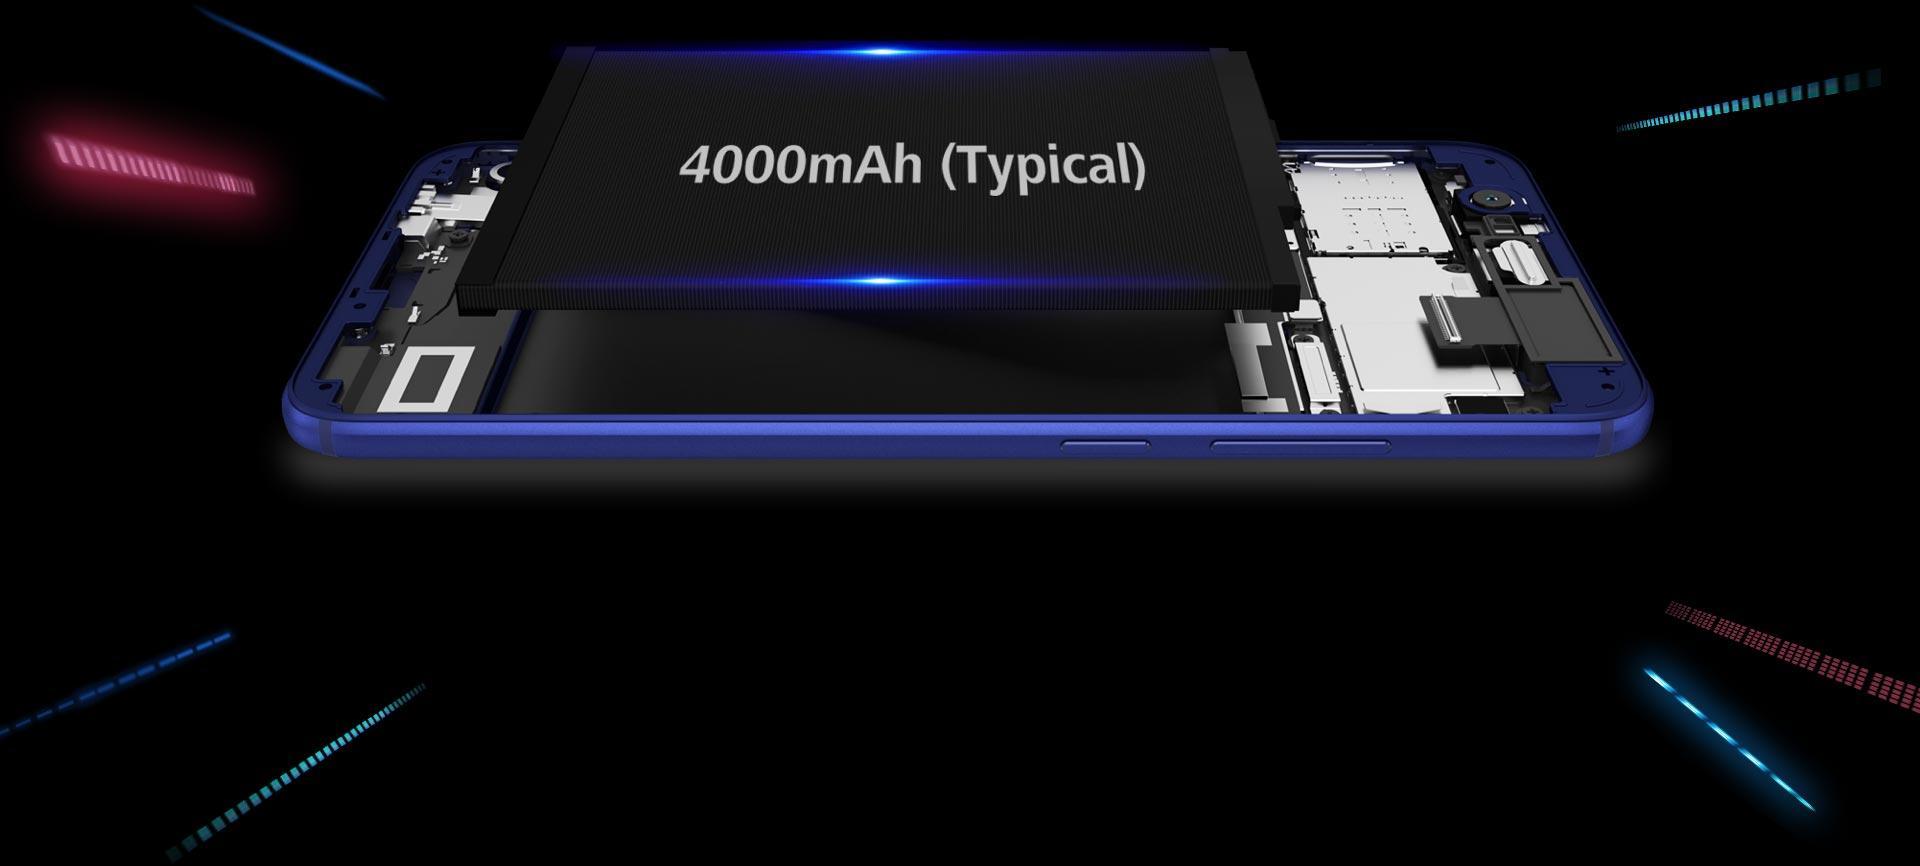 honor 8 pro smartphone 6 gb dual sim blu elettronica. Black Bedroom Furniture Sets. Home Design Ideas